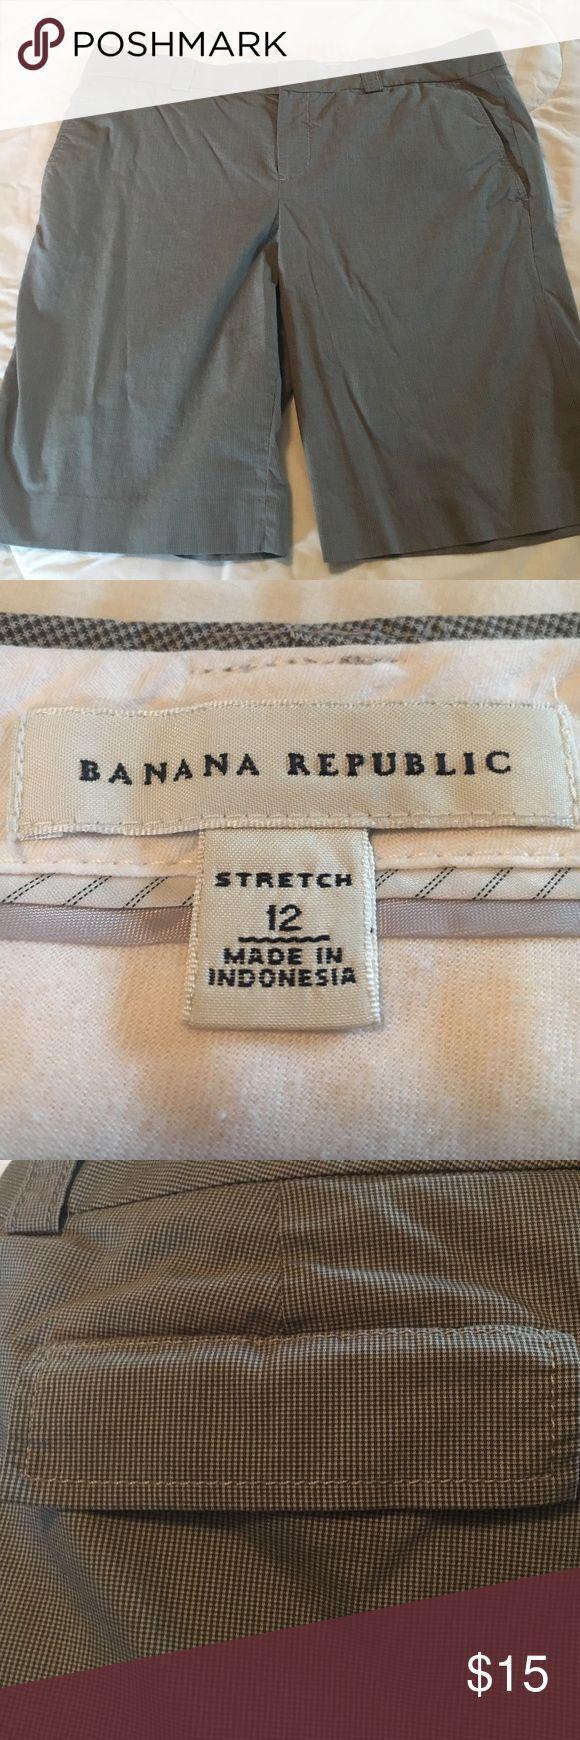 Banana Republic Stretch Dressy Shorts Banana Republic Stretch Dressy Shorts Banana Republic Shorts